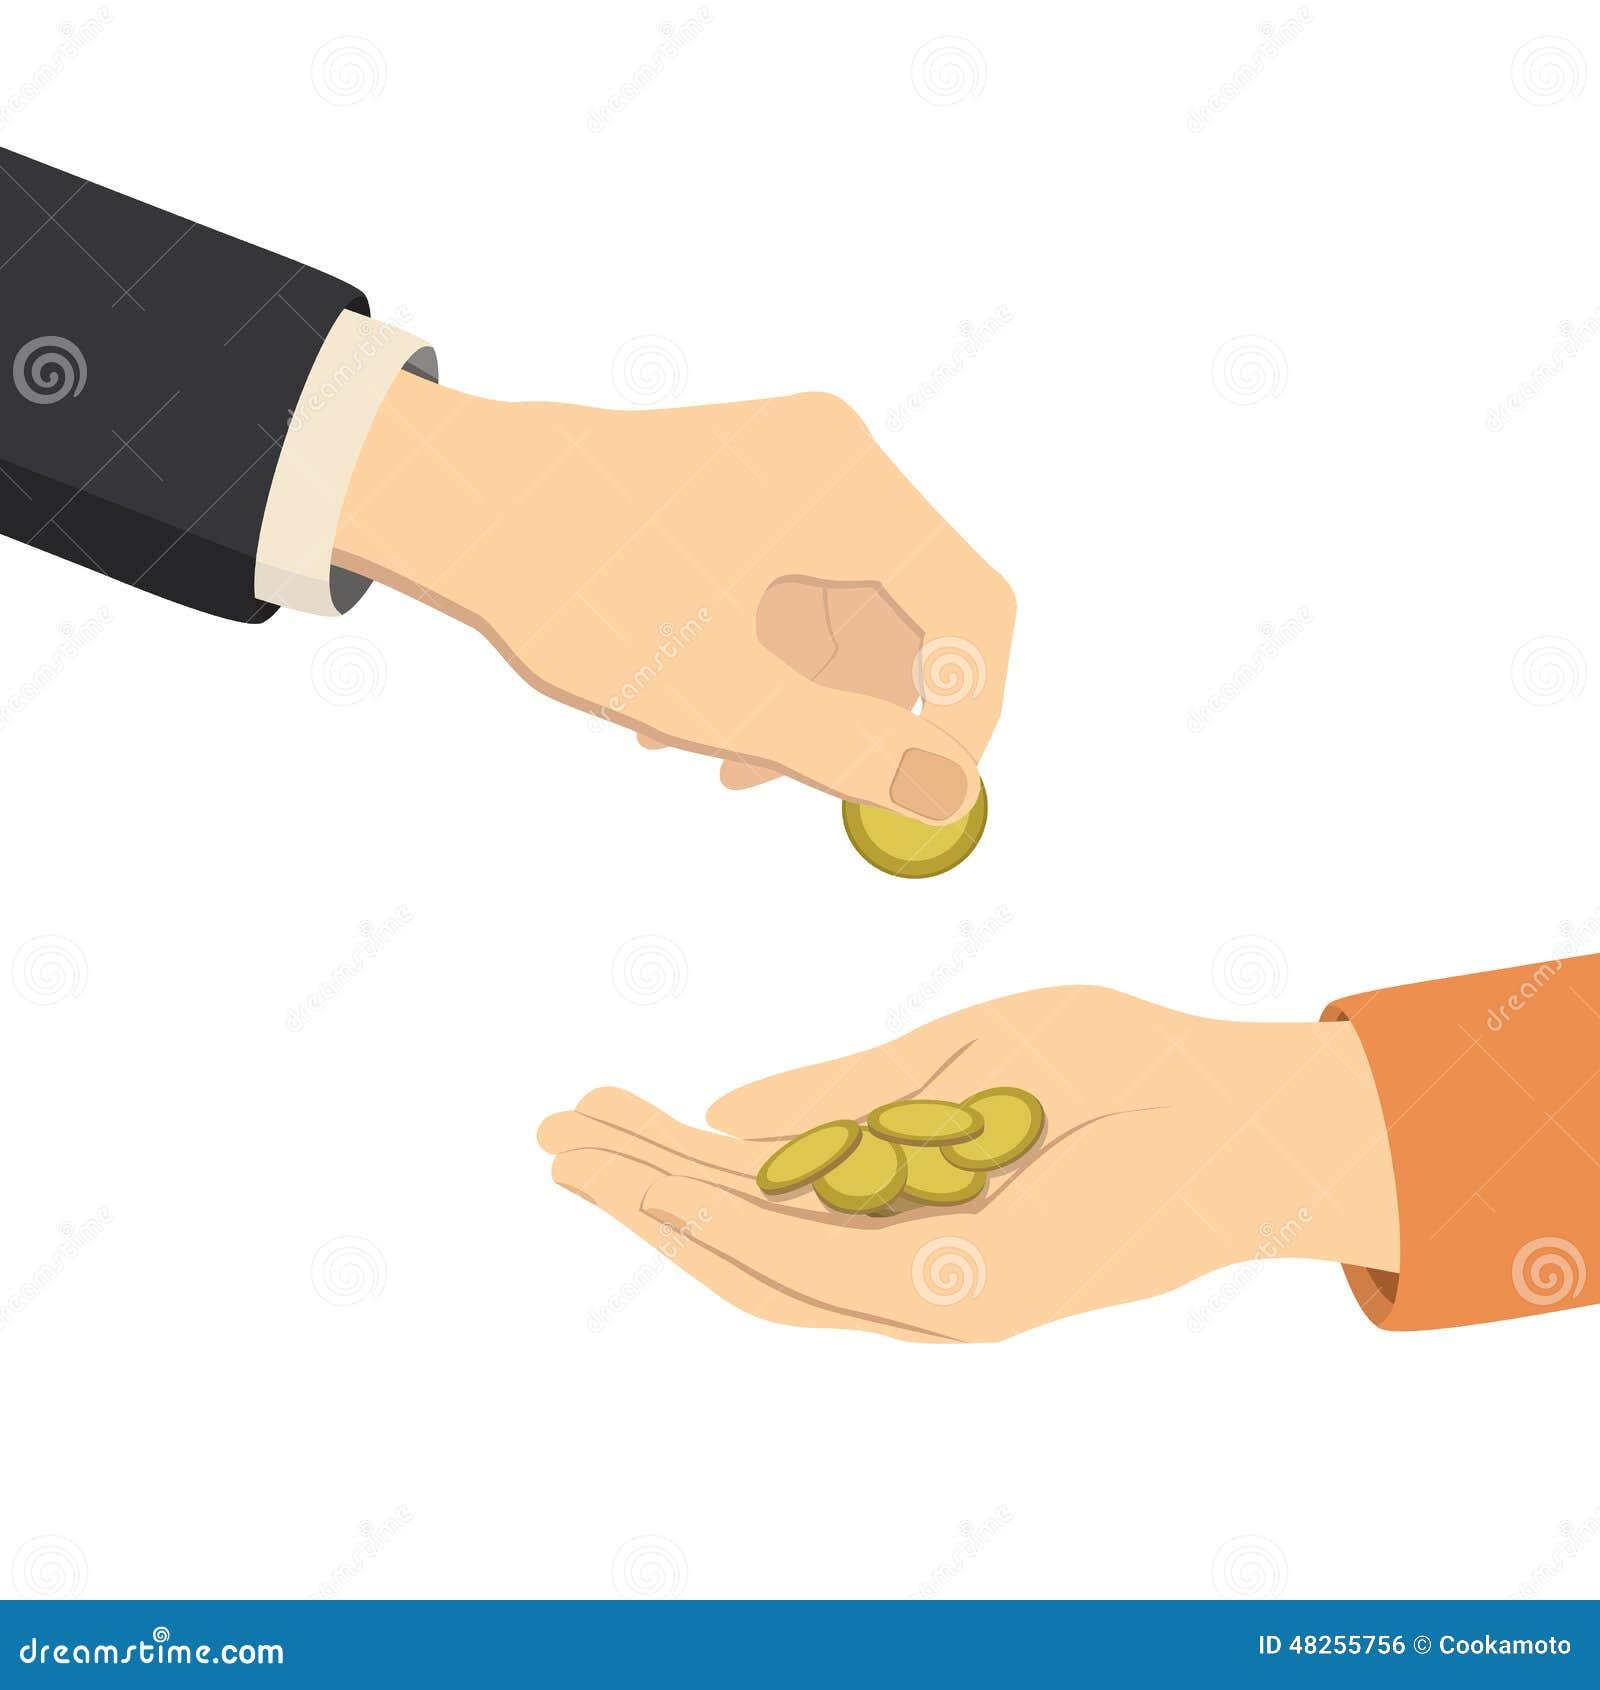 Cheese Fondue Hands Giving And Receiving Money Vector Stock Vector